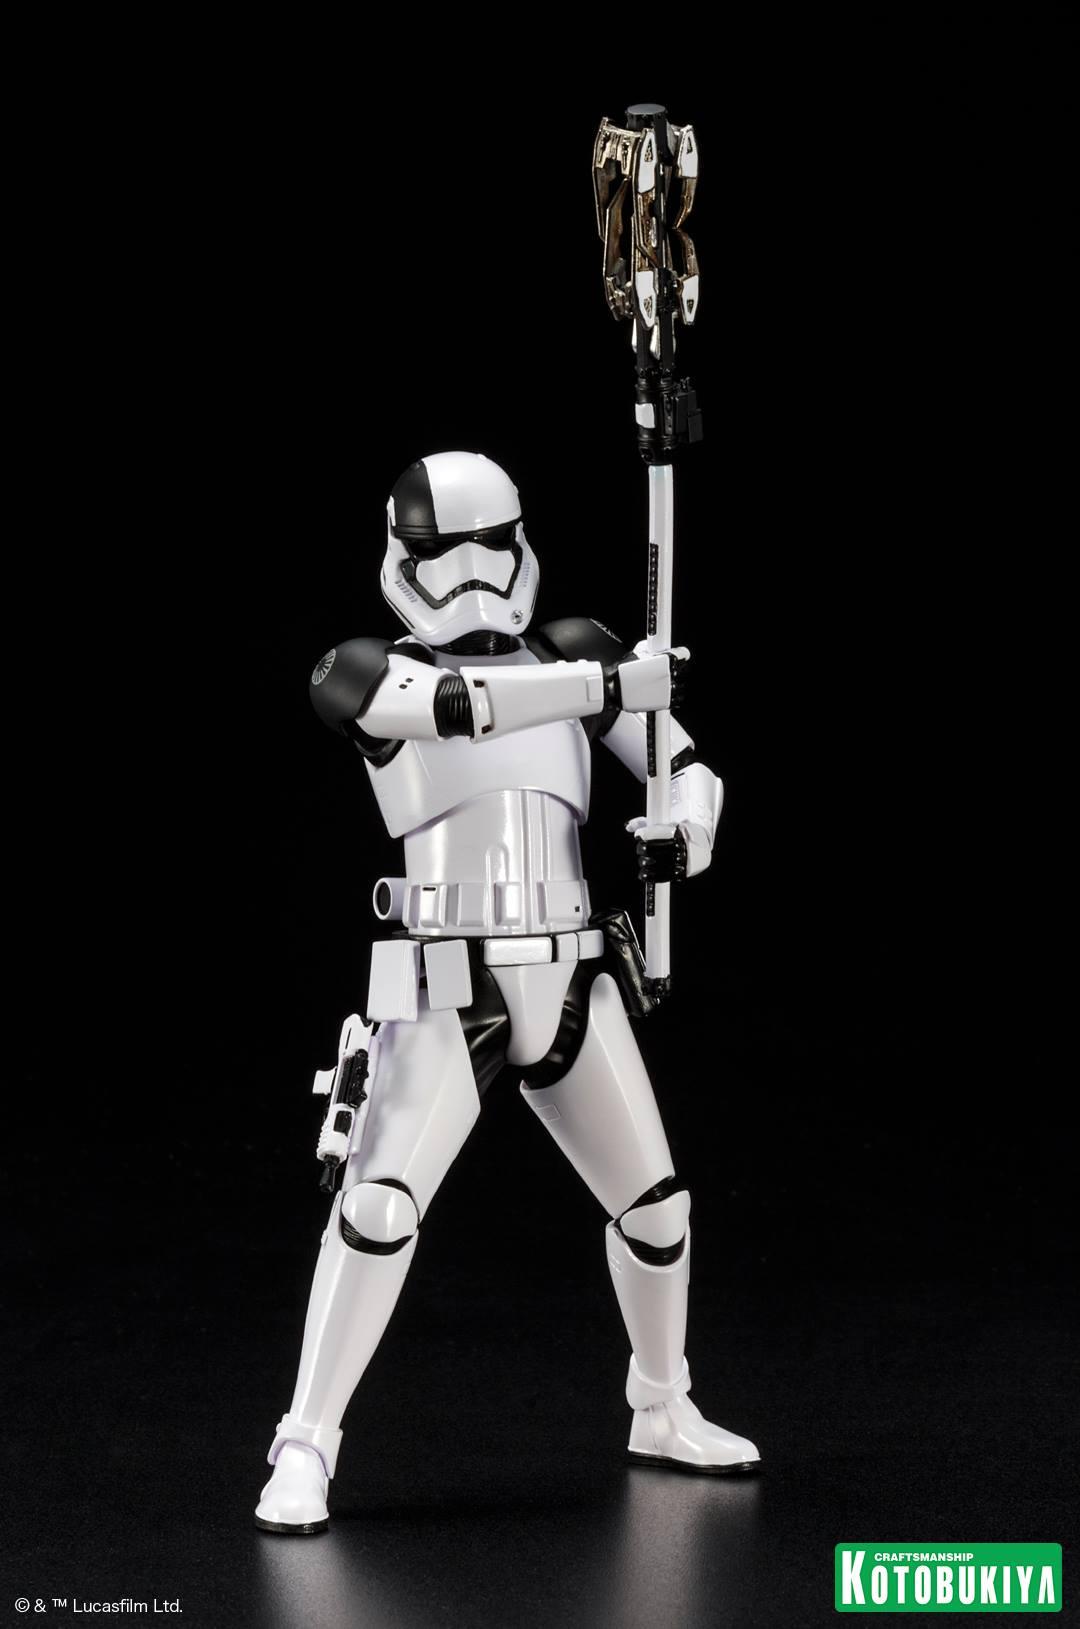 First Order Stormtrooper Executioner ARTFX+